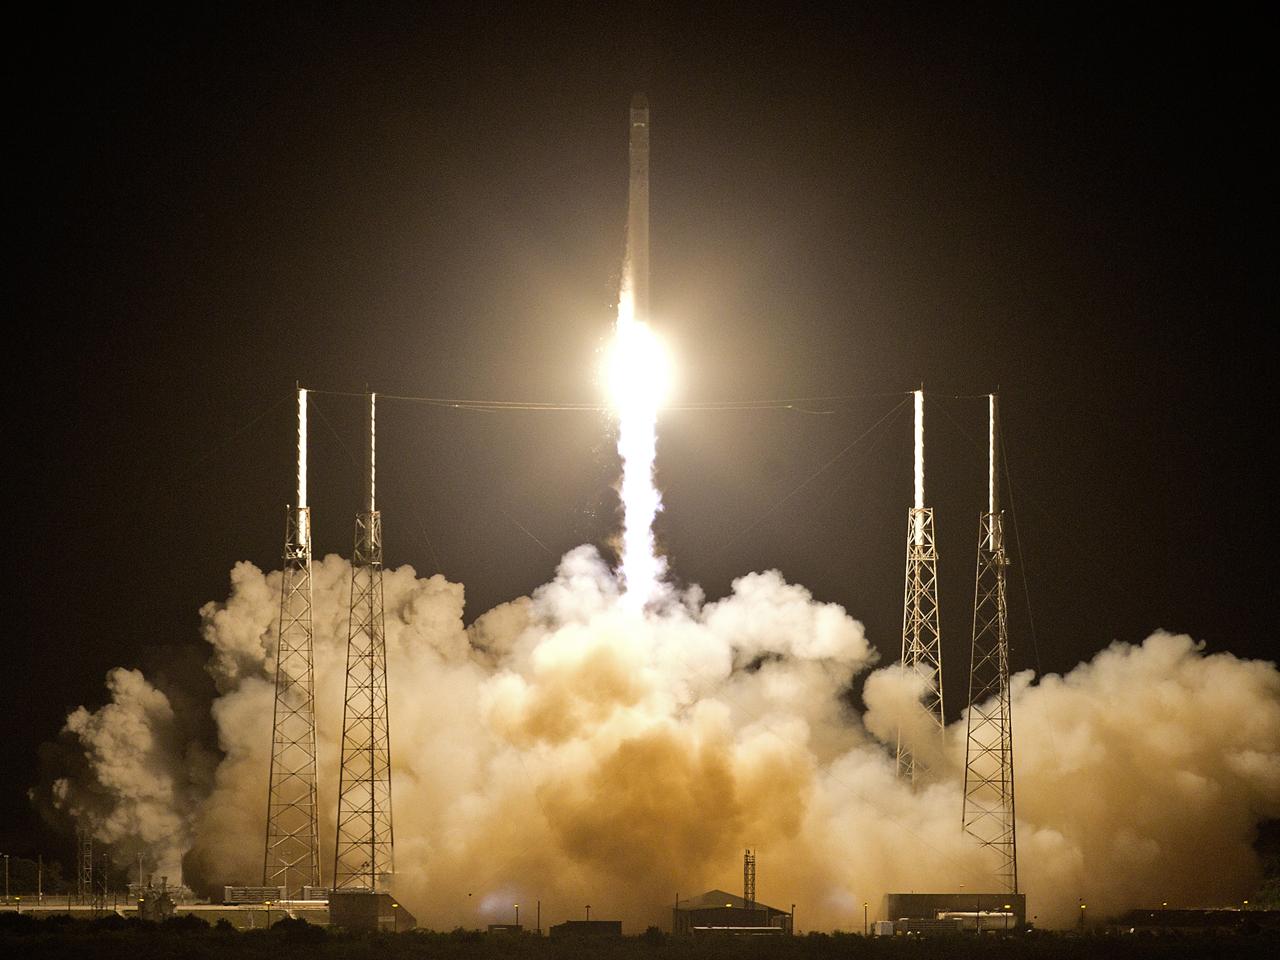 elon musk spacex stock - photo #35